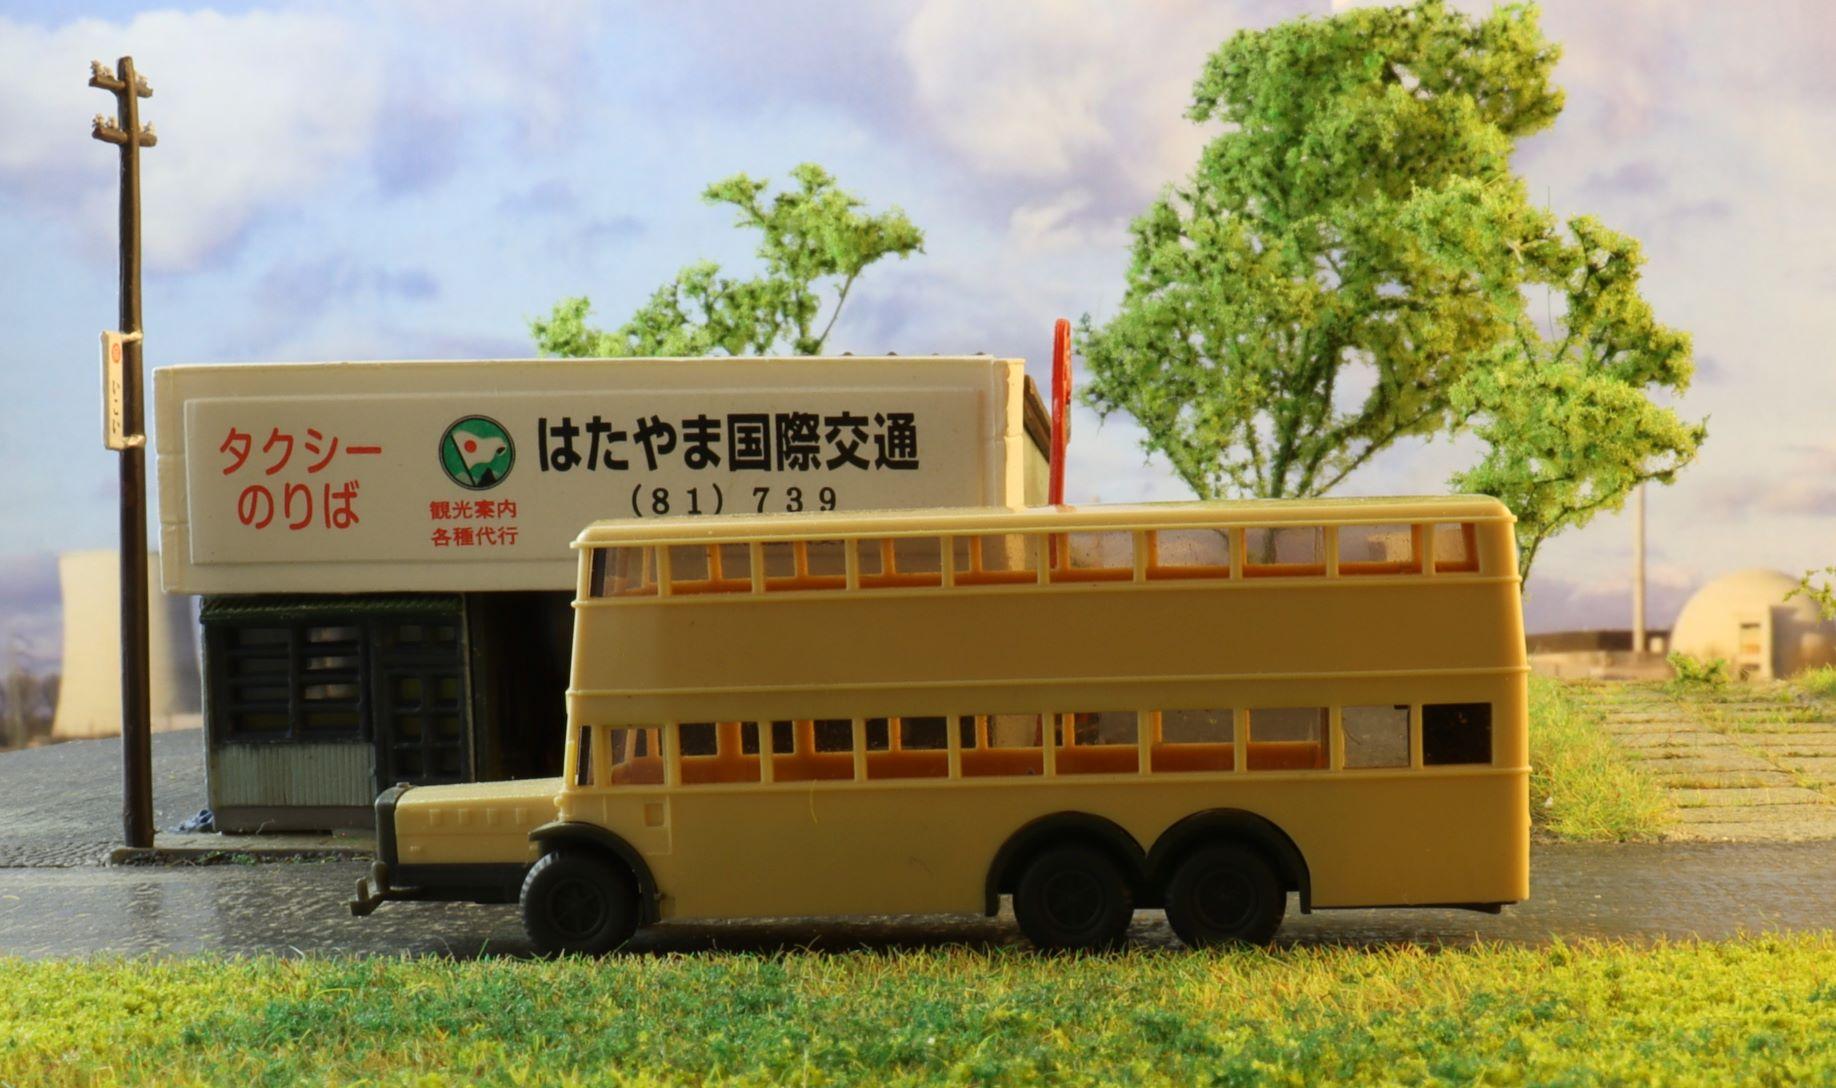 Bussing Autobus .JPG